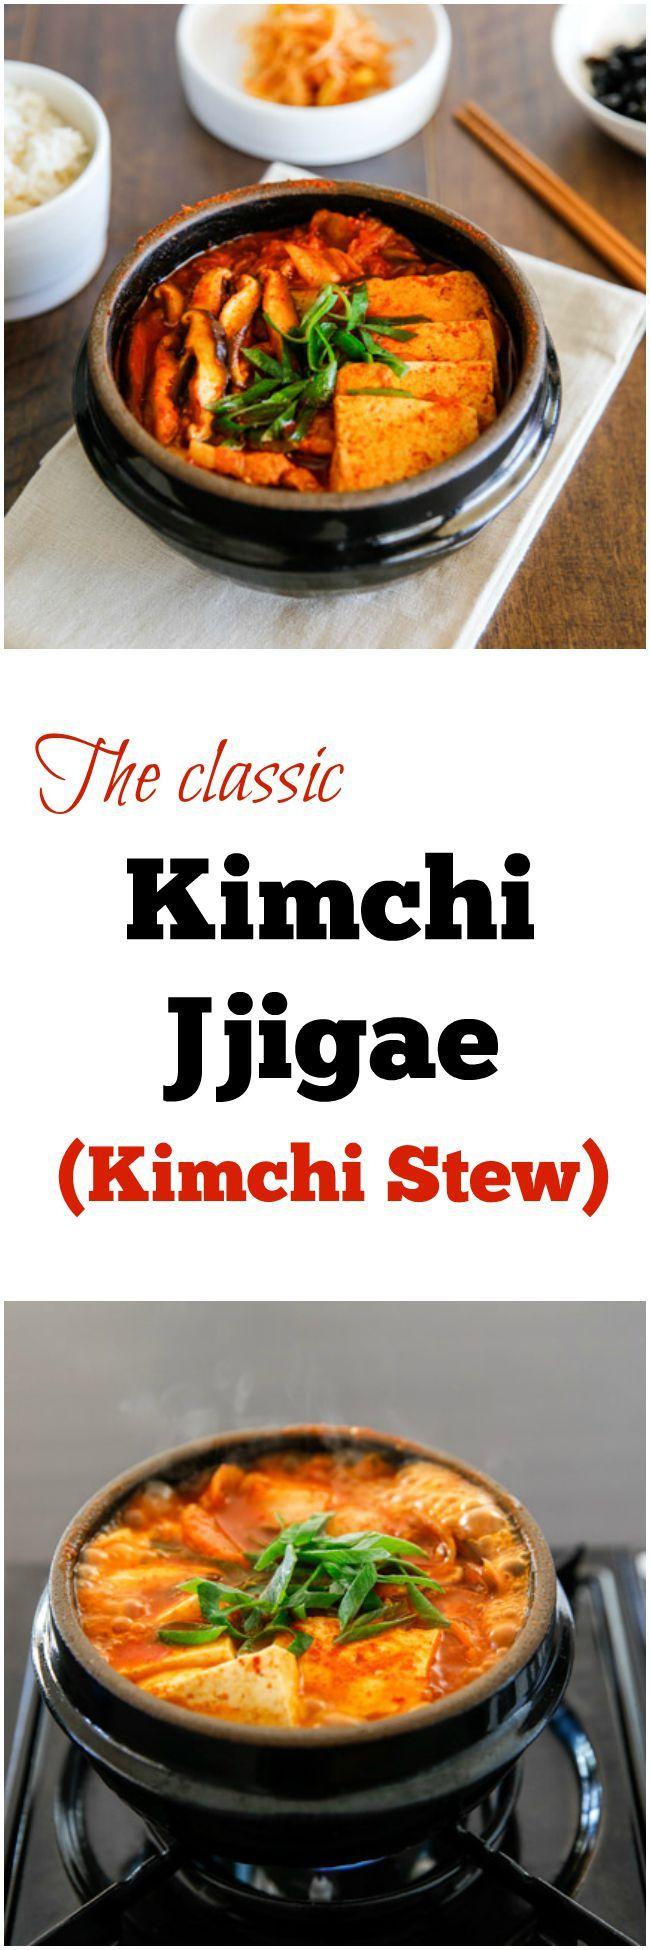 The classic, Kimchi Jjigae | Rezept | Korean Food ...